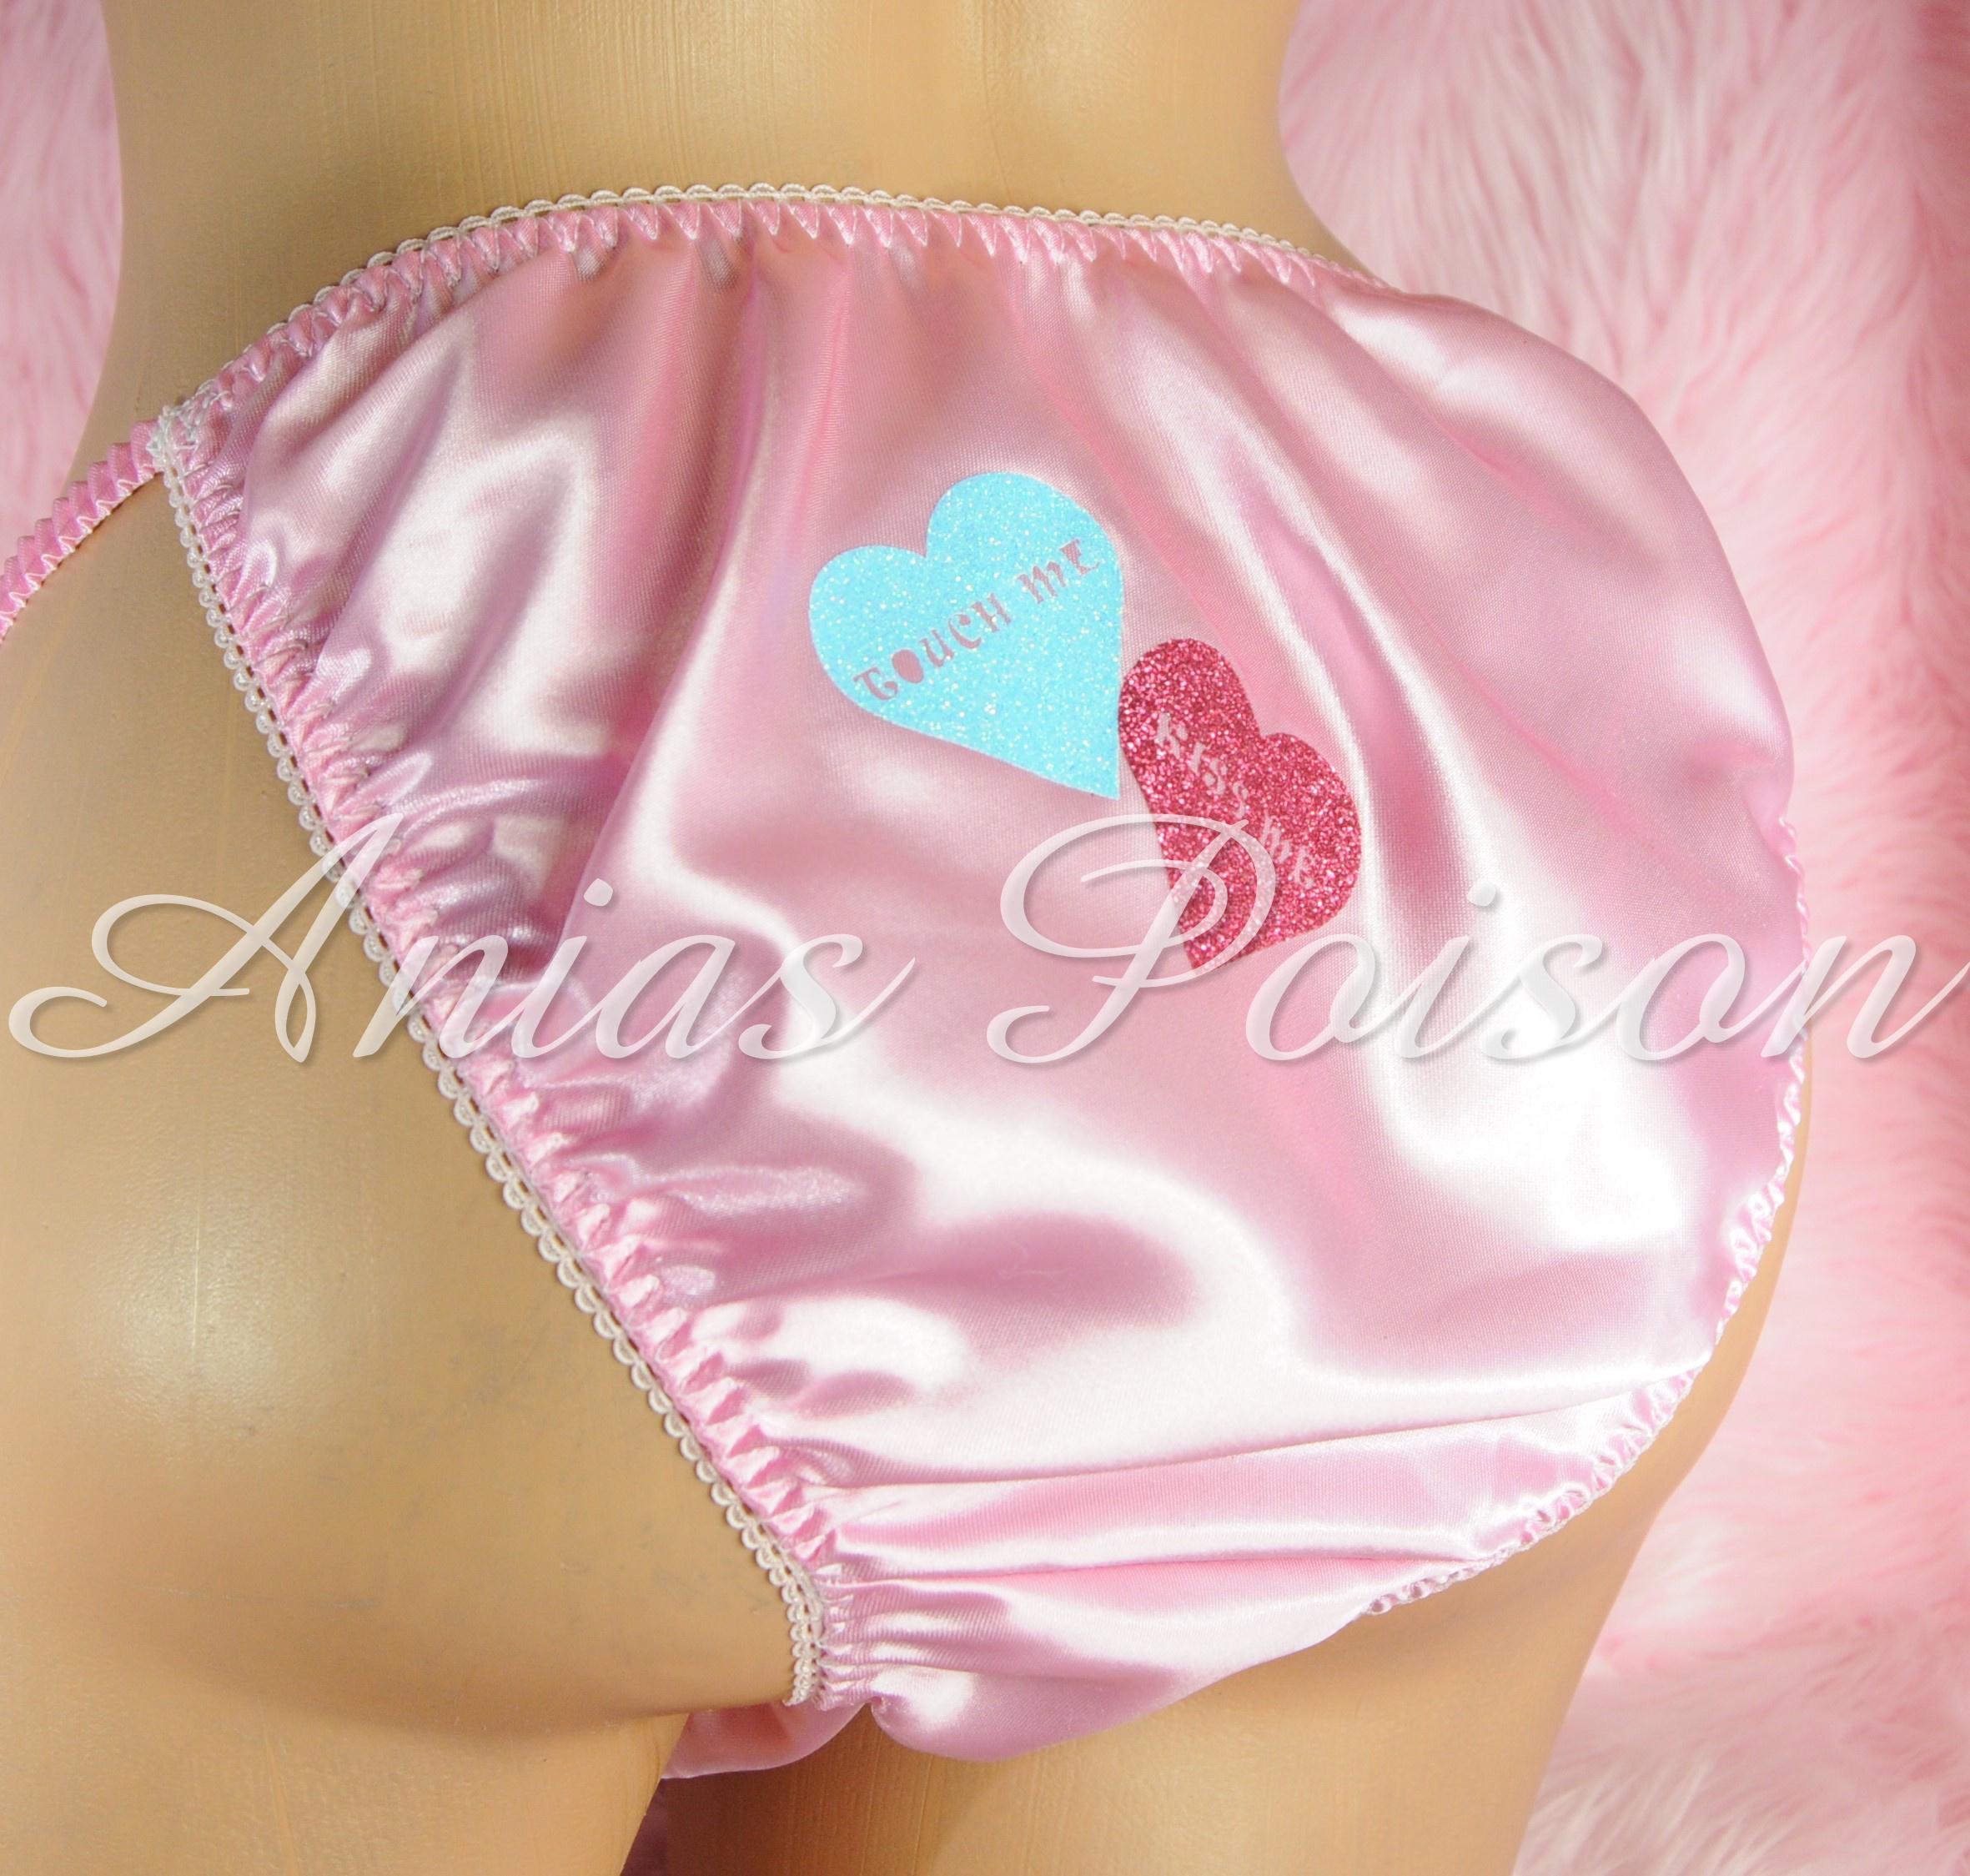 Valentine's Day Satin Mens Sissy Custom Conversation Heart 80s style string bikini panties